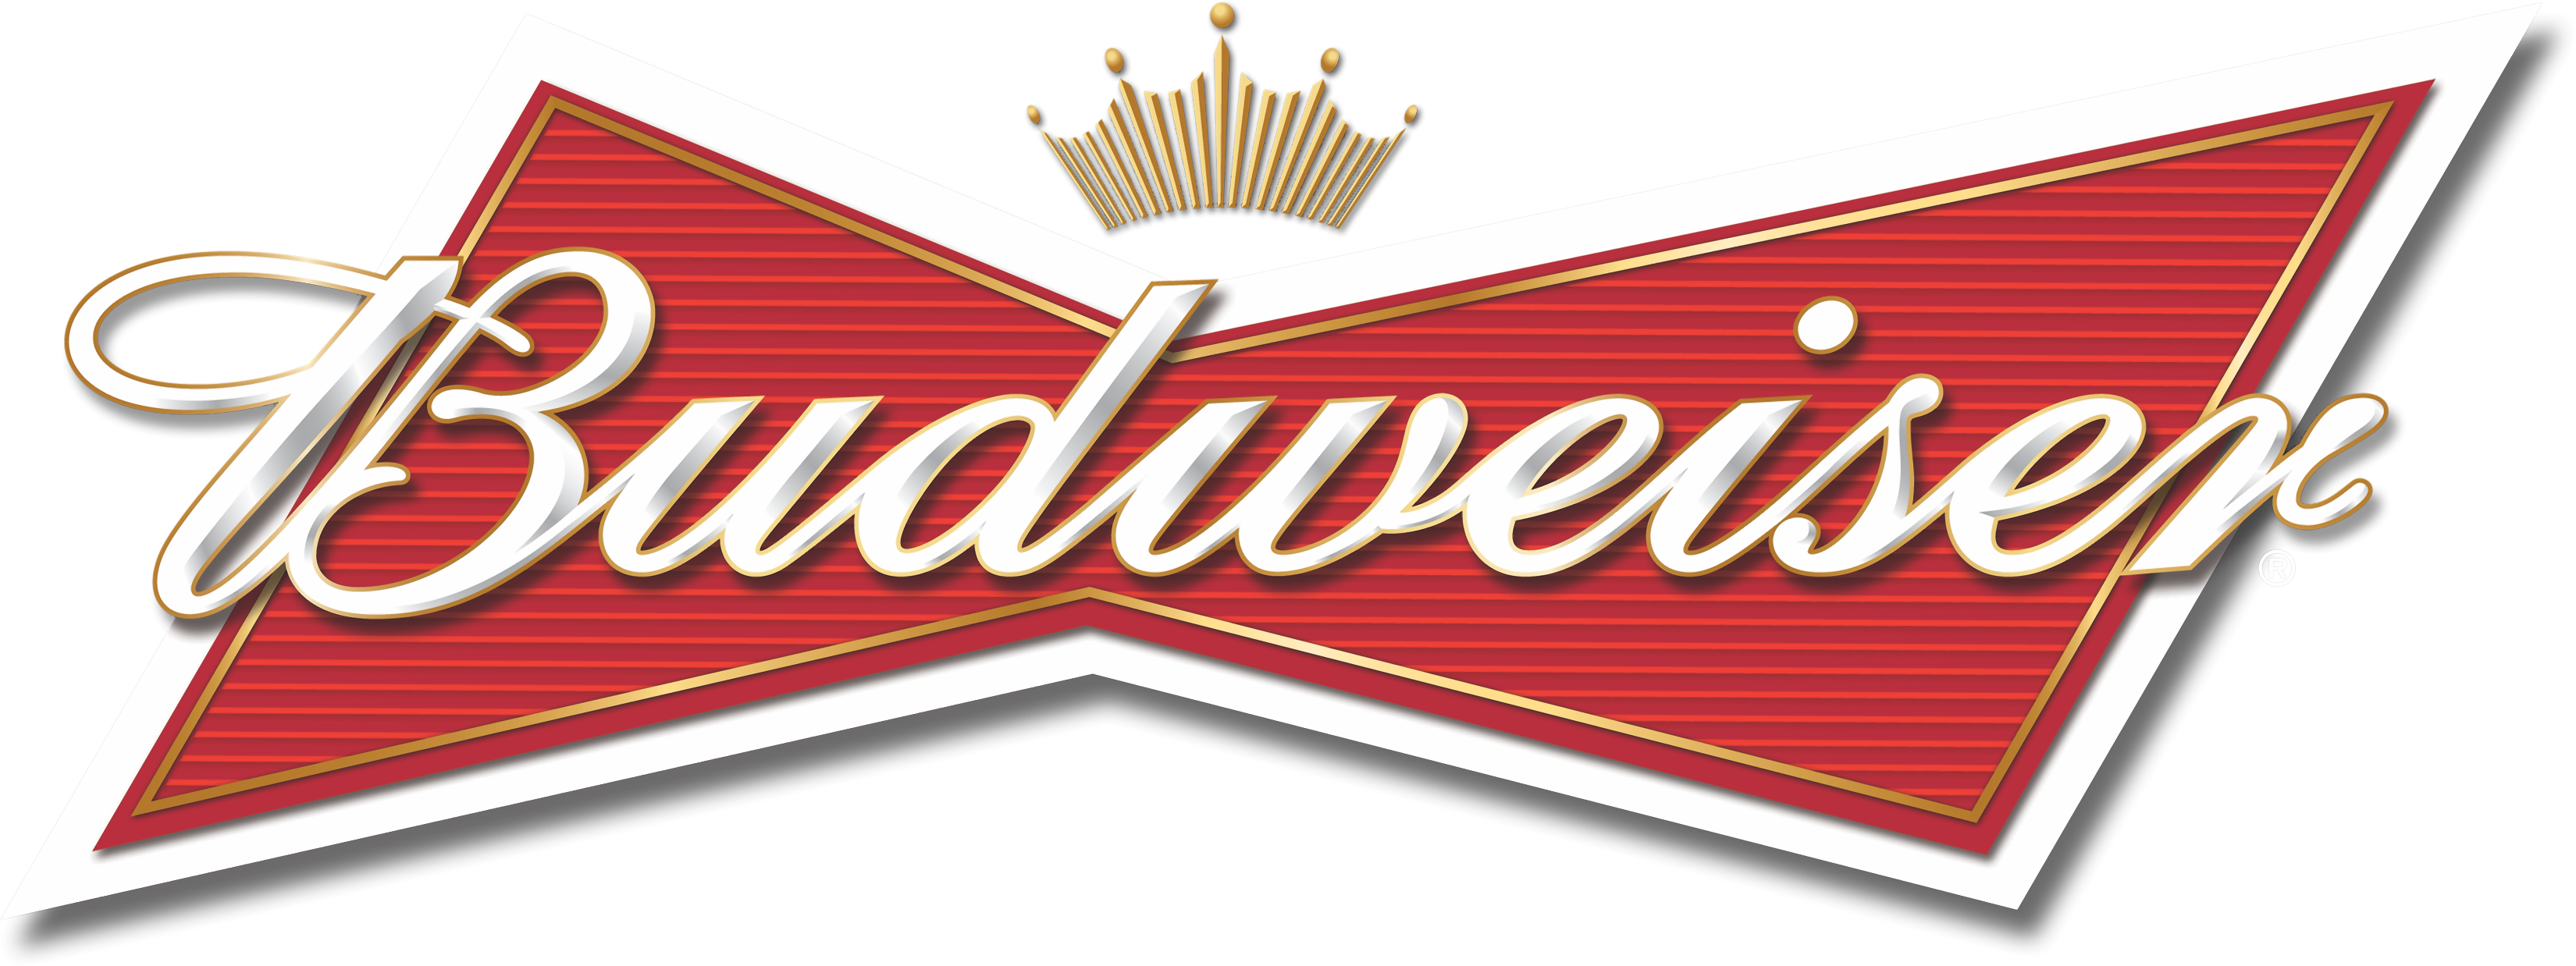 budweiser logo png free transparent png logos superman logo template free superman logo template customizable